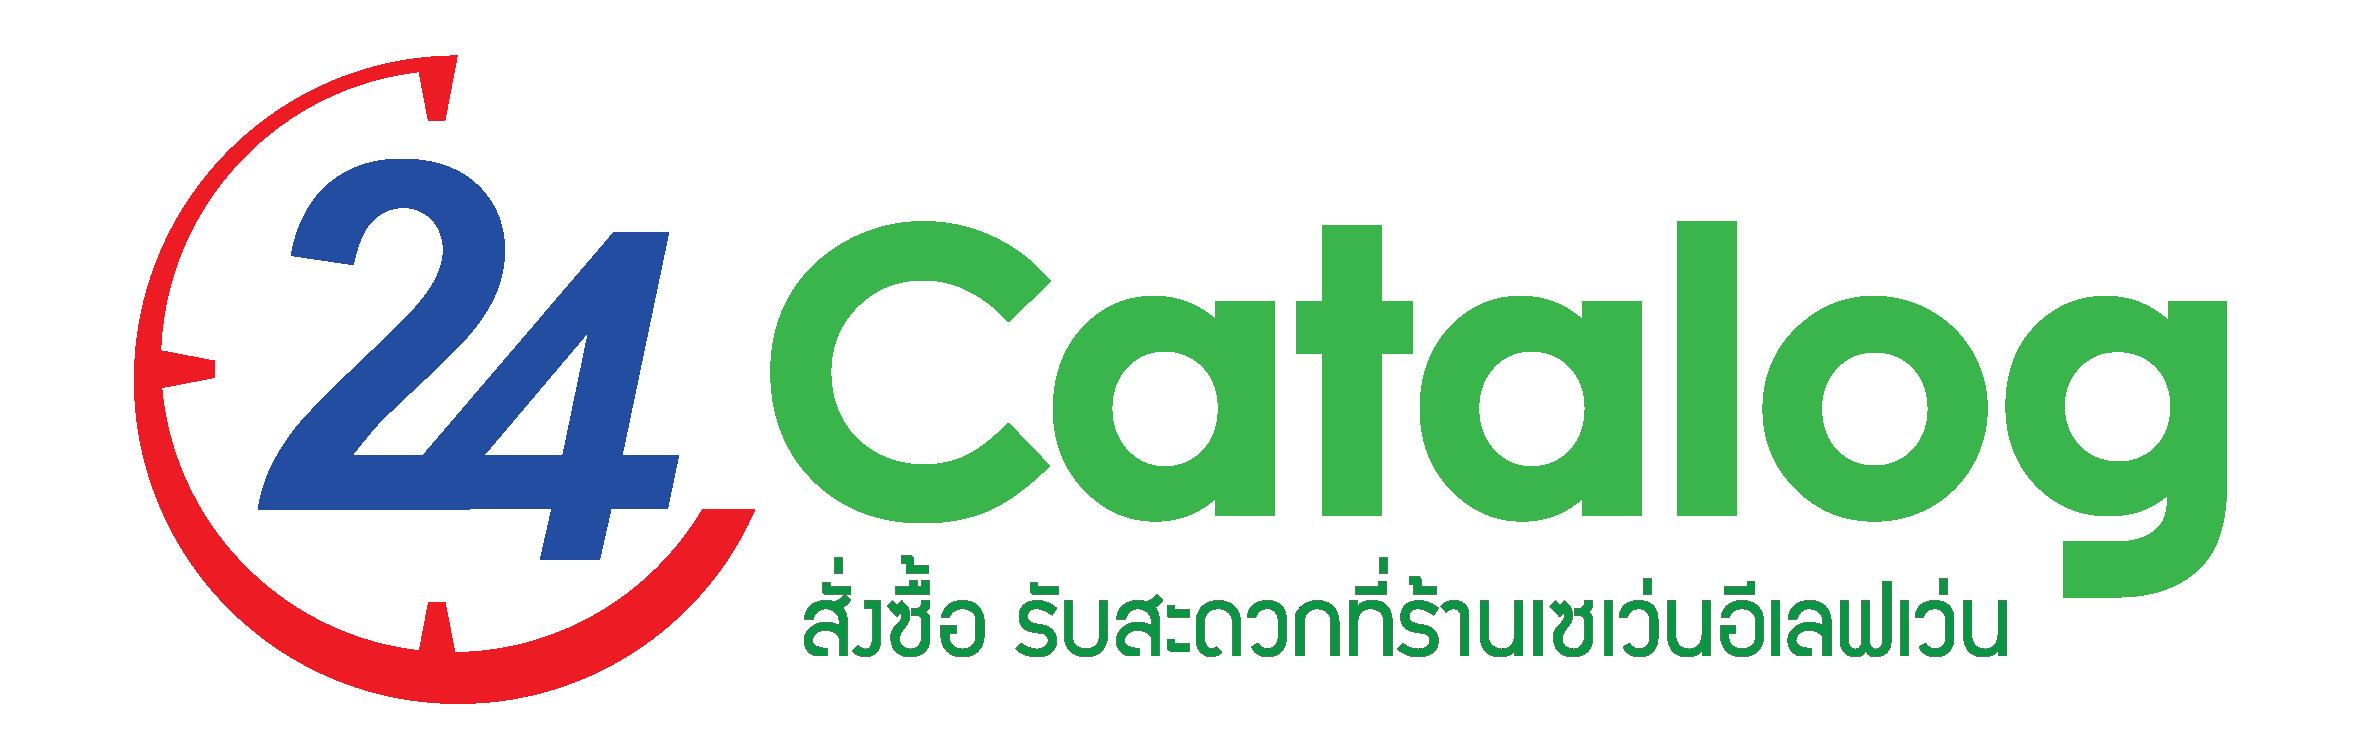 logo_24Catalog-01